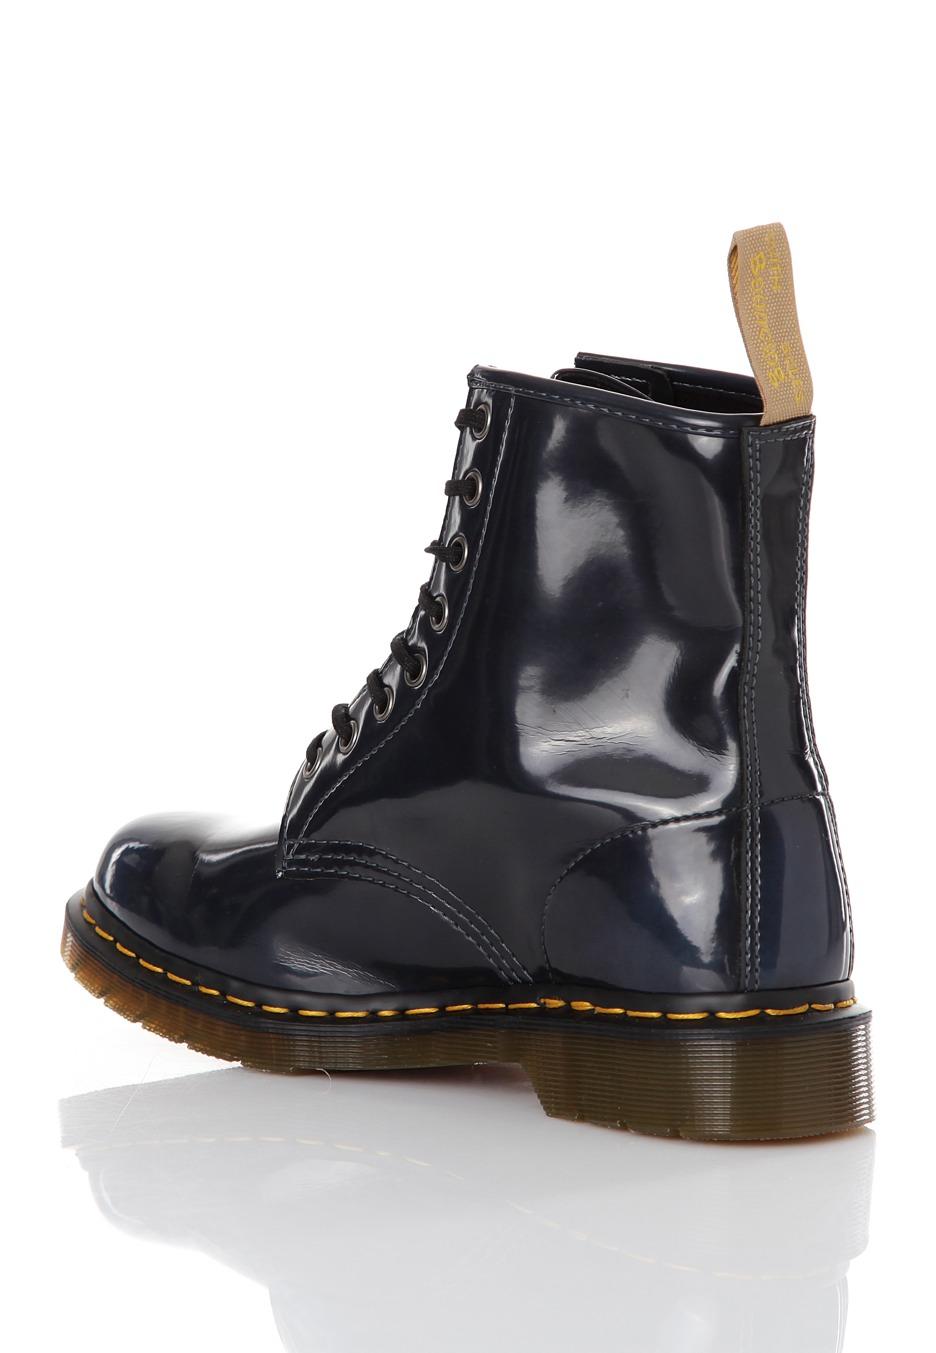 f0ae967ea6e Dr. Martens - Vegan 8 Eye Boot Navy - Dámské boty - Impericon.com CZ SK